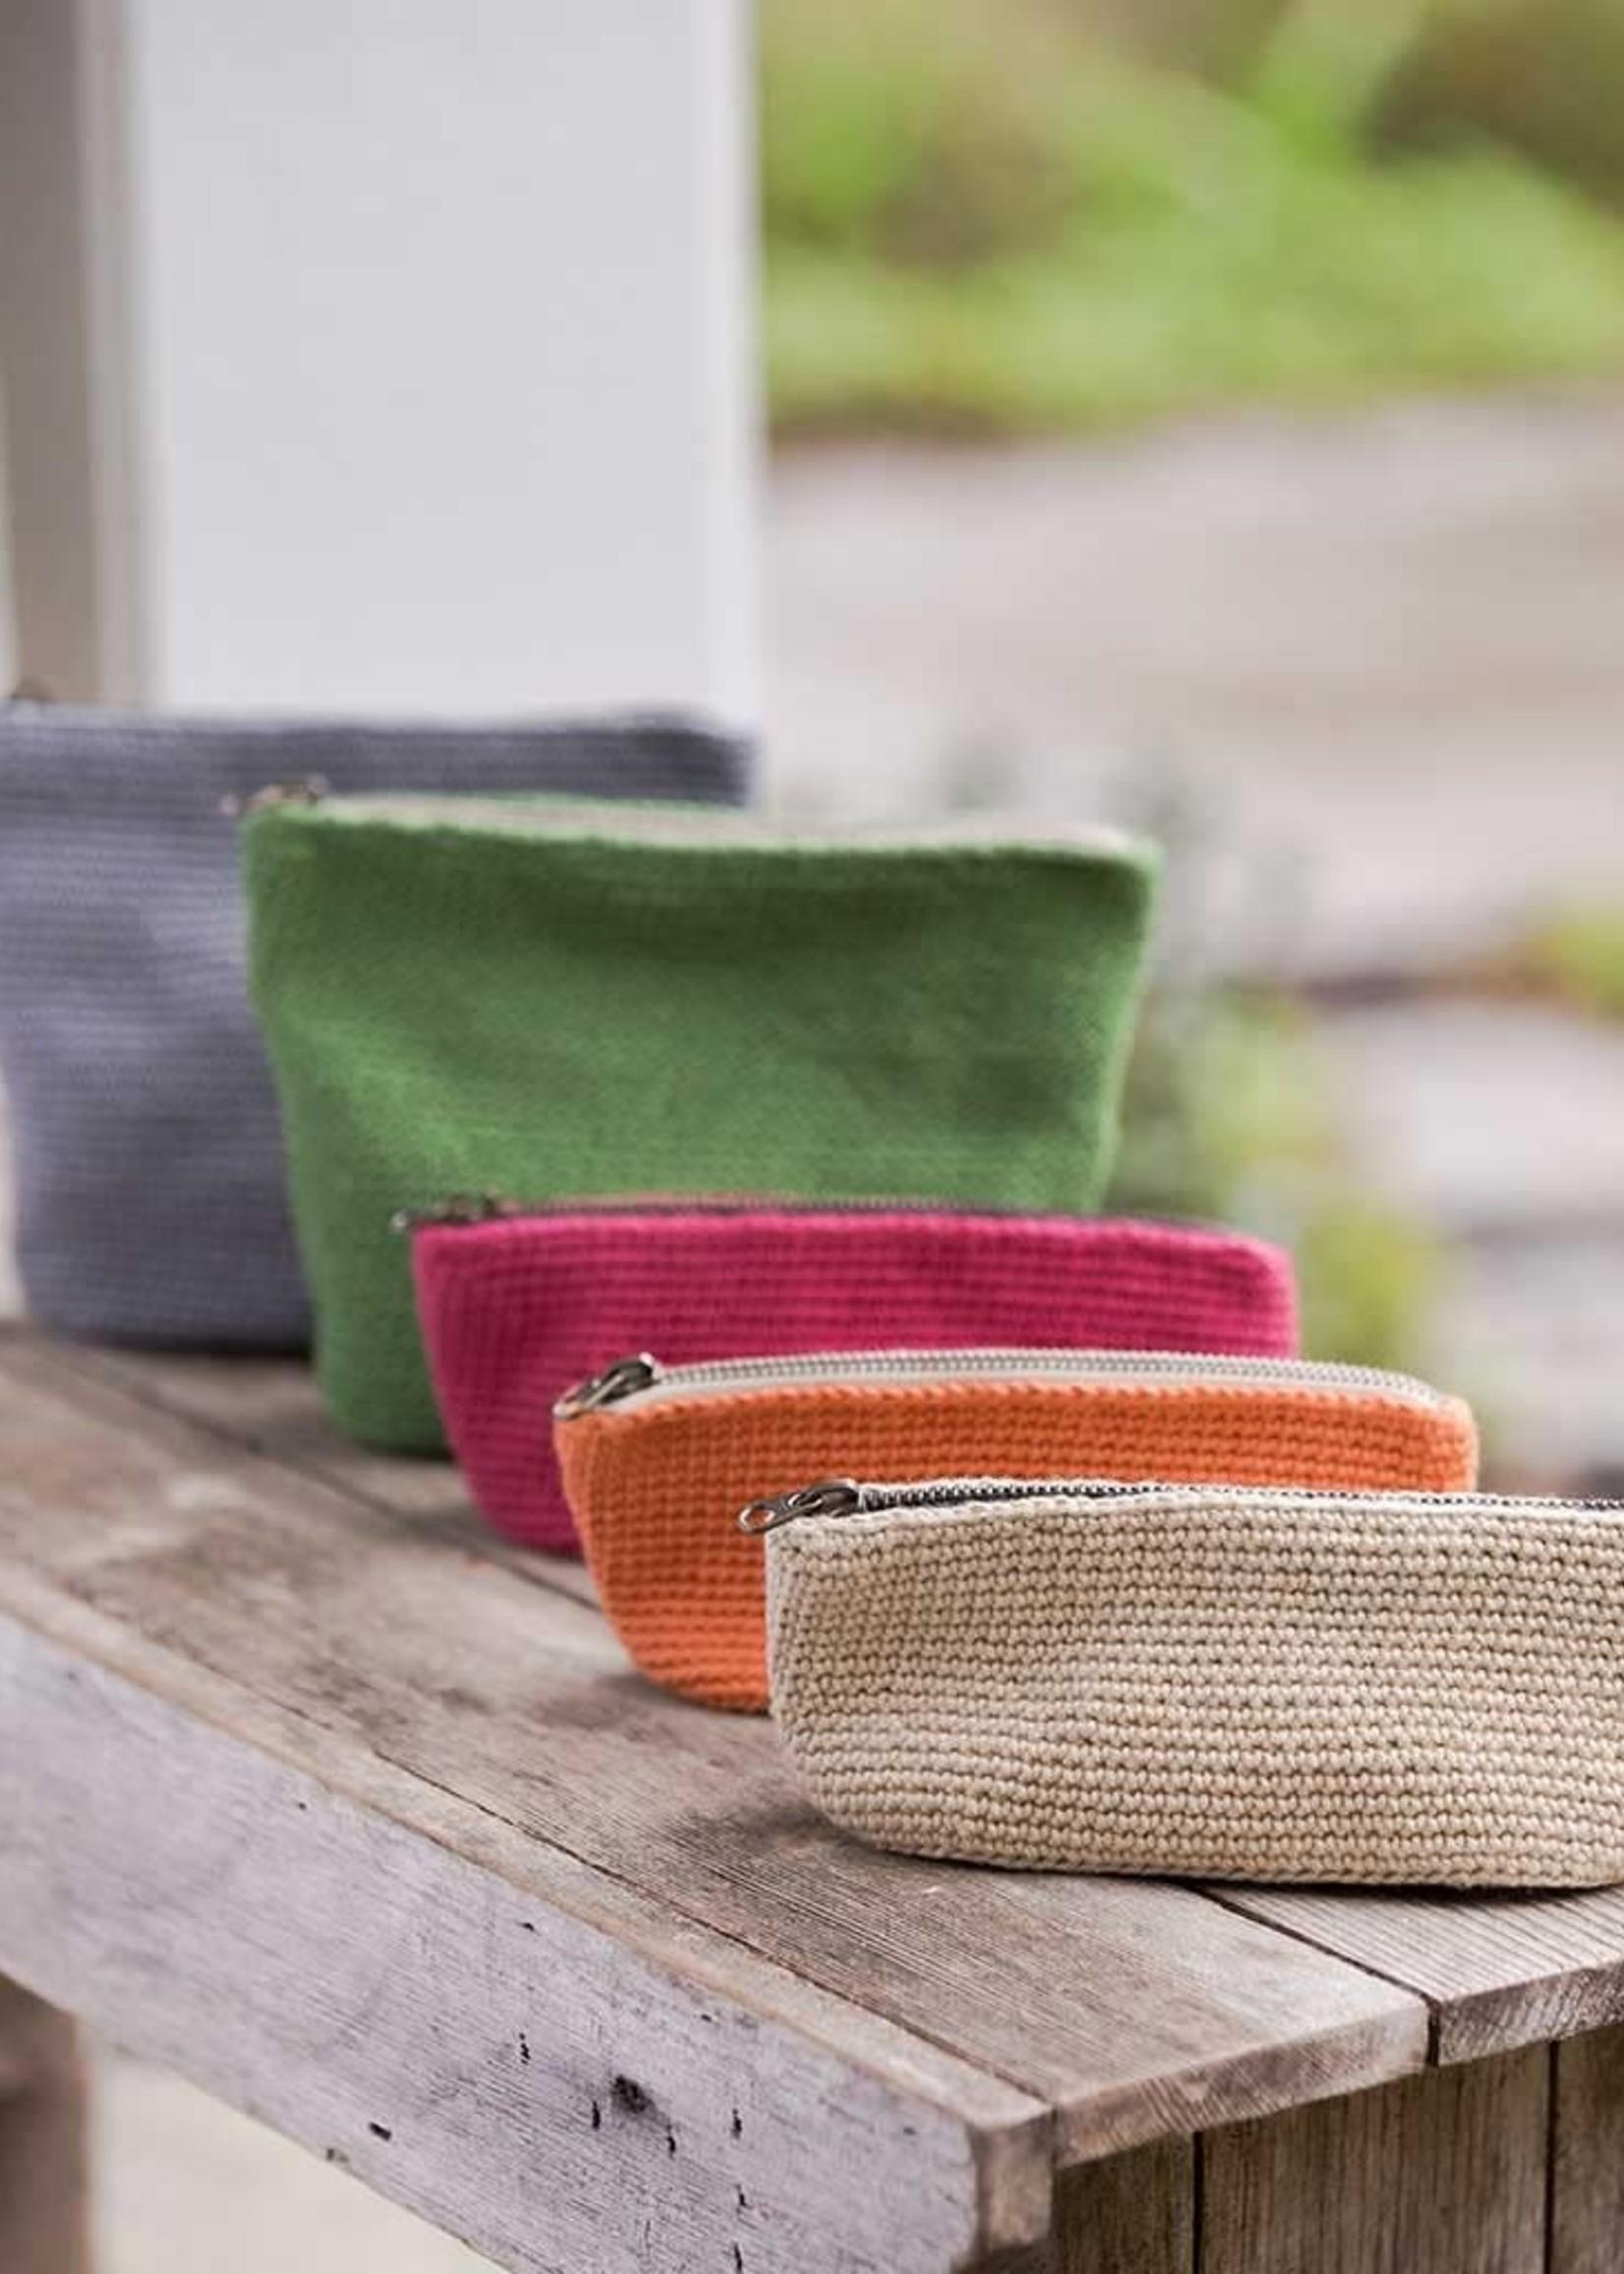 Churchmouse Churchmouse Pattern Crochet Oval Bucket Bags/Pouches